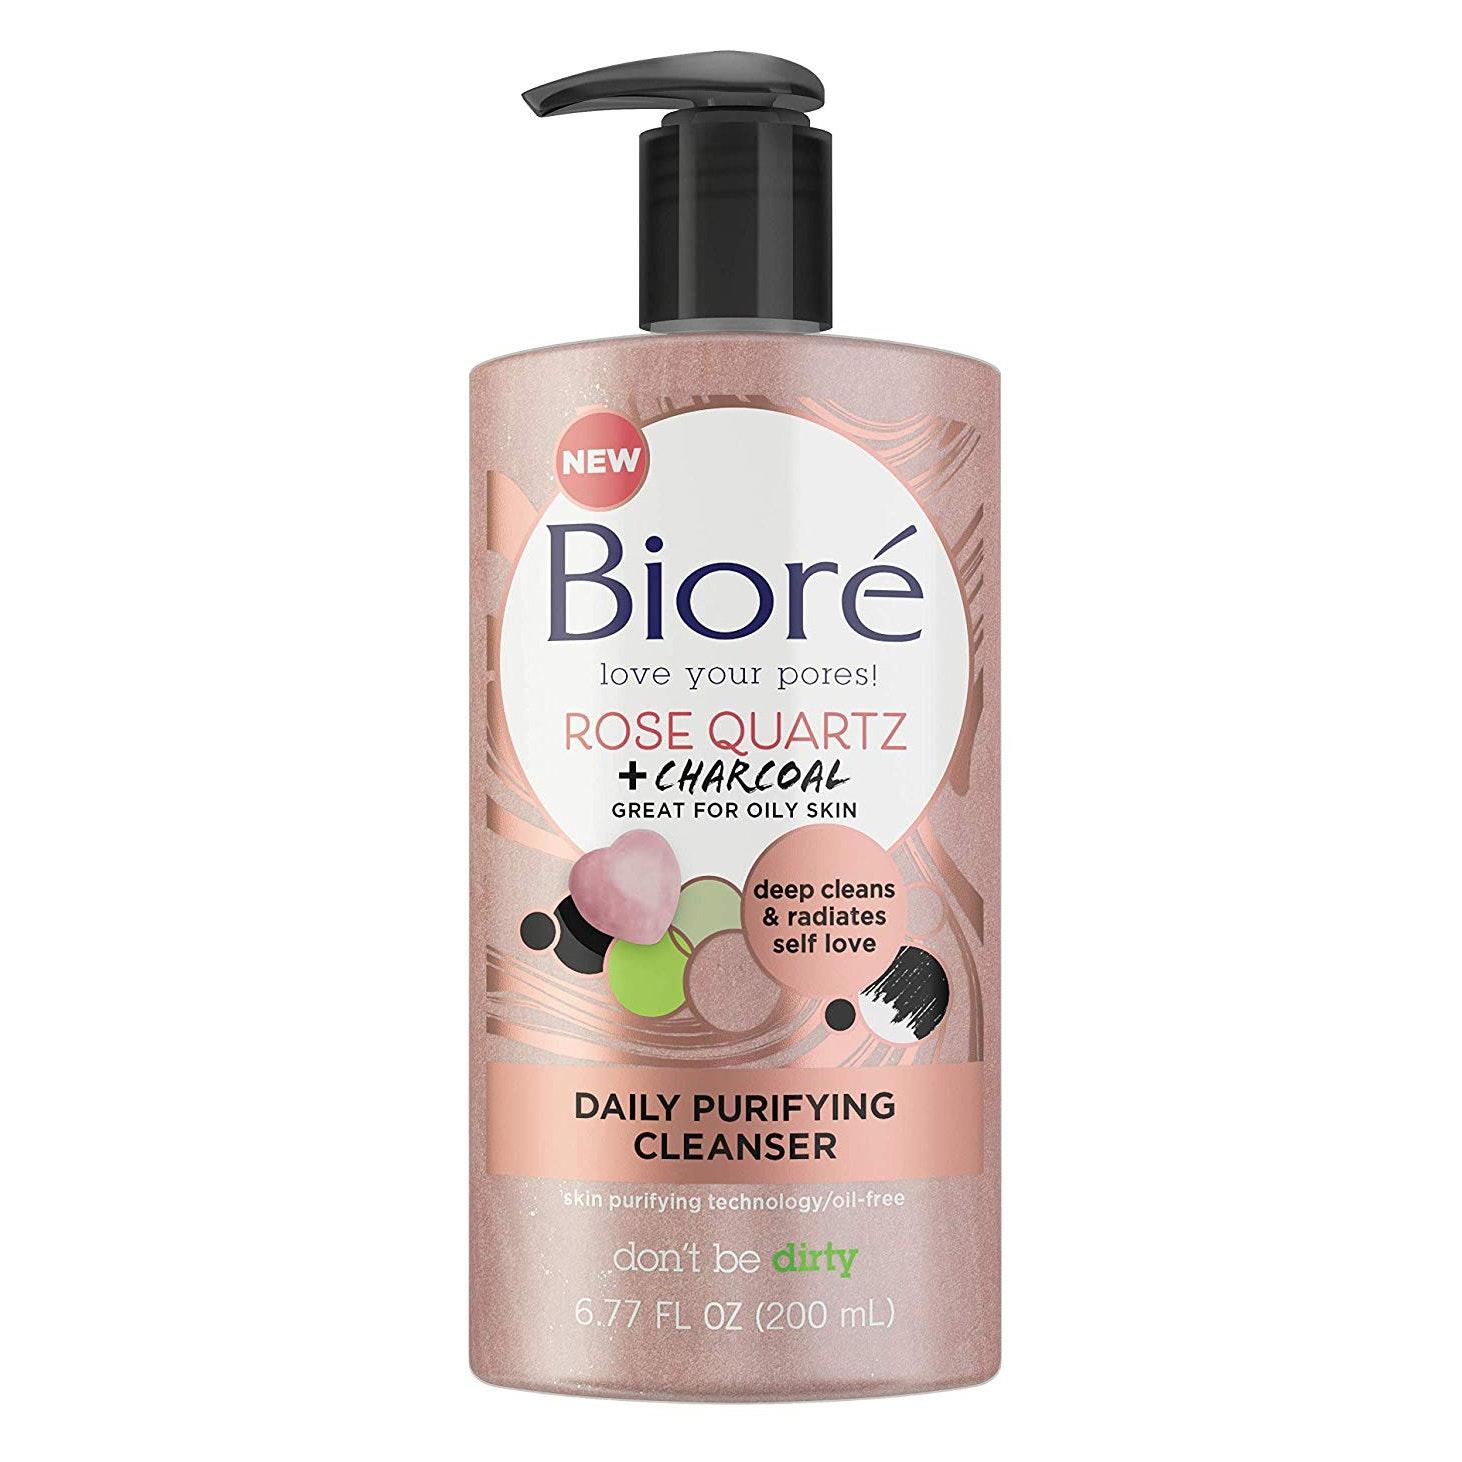 Bioré® Rose Quartz + Charcoal Daily Purifying Cleanser